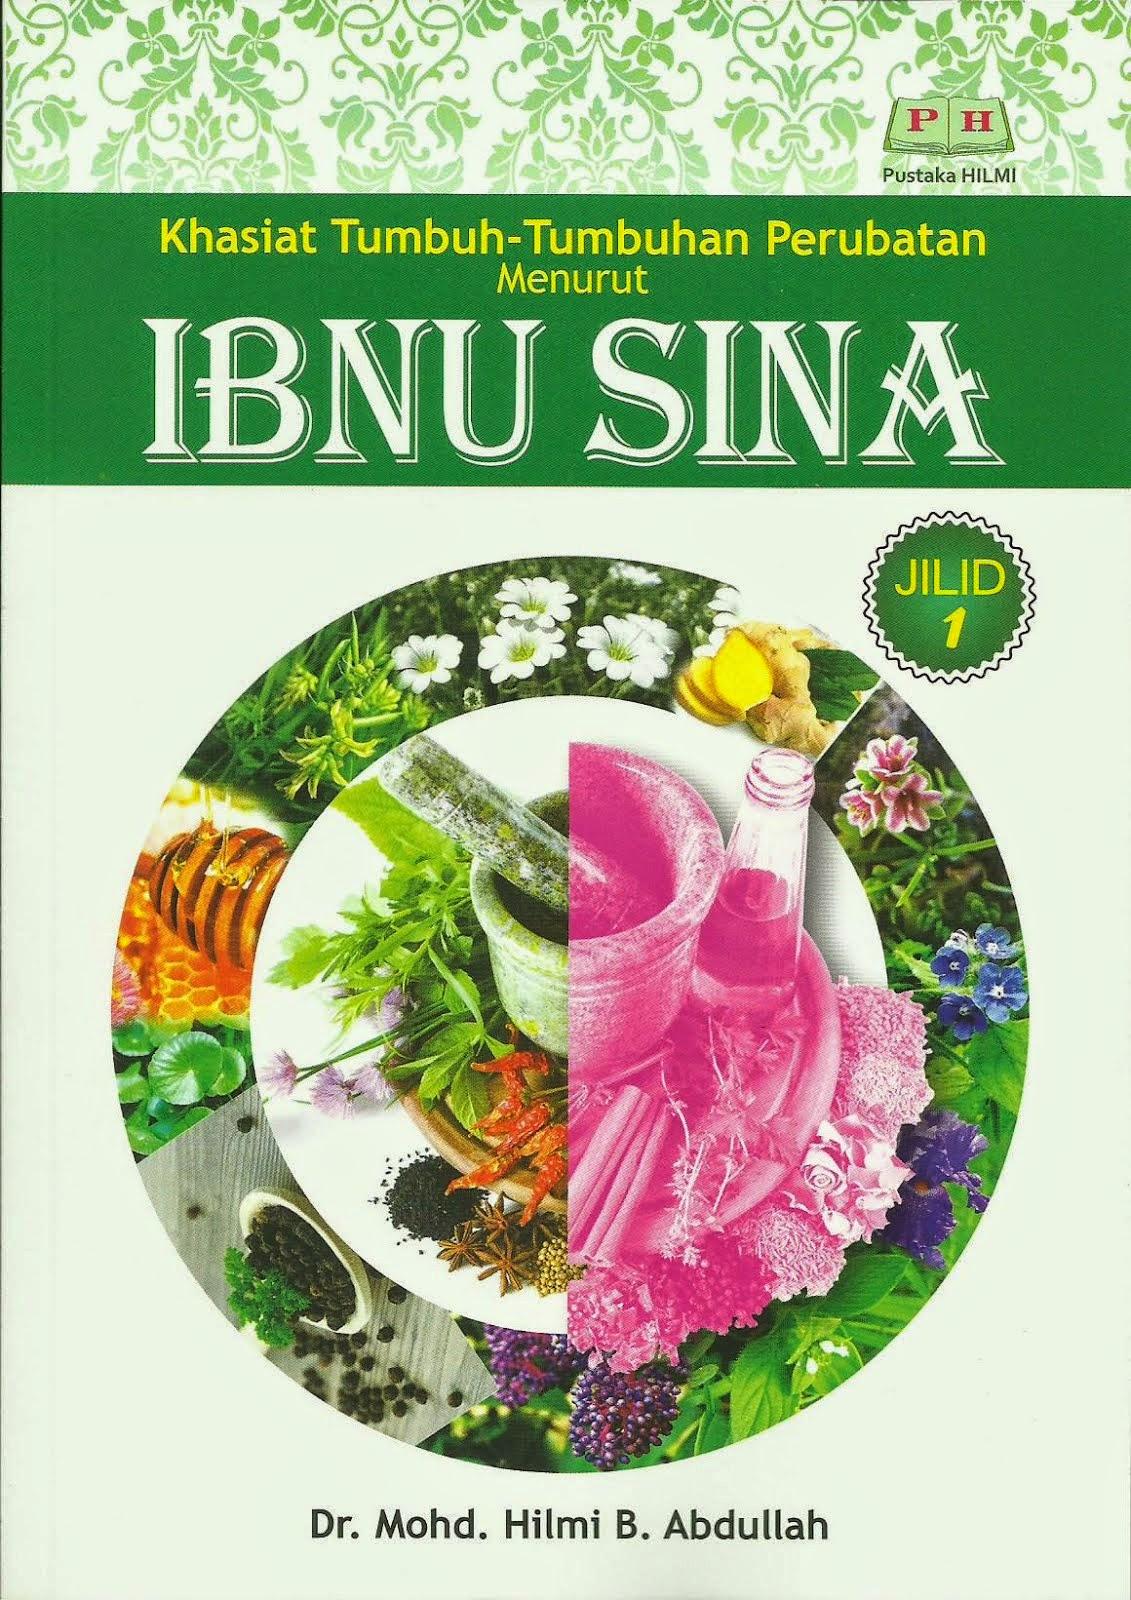 Khasiat Tumbuhan-Tumbuhan Perubatan Menurut Ibnu Sina Jilid 1